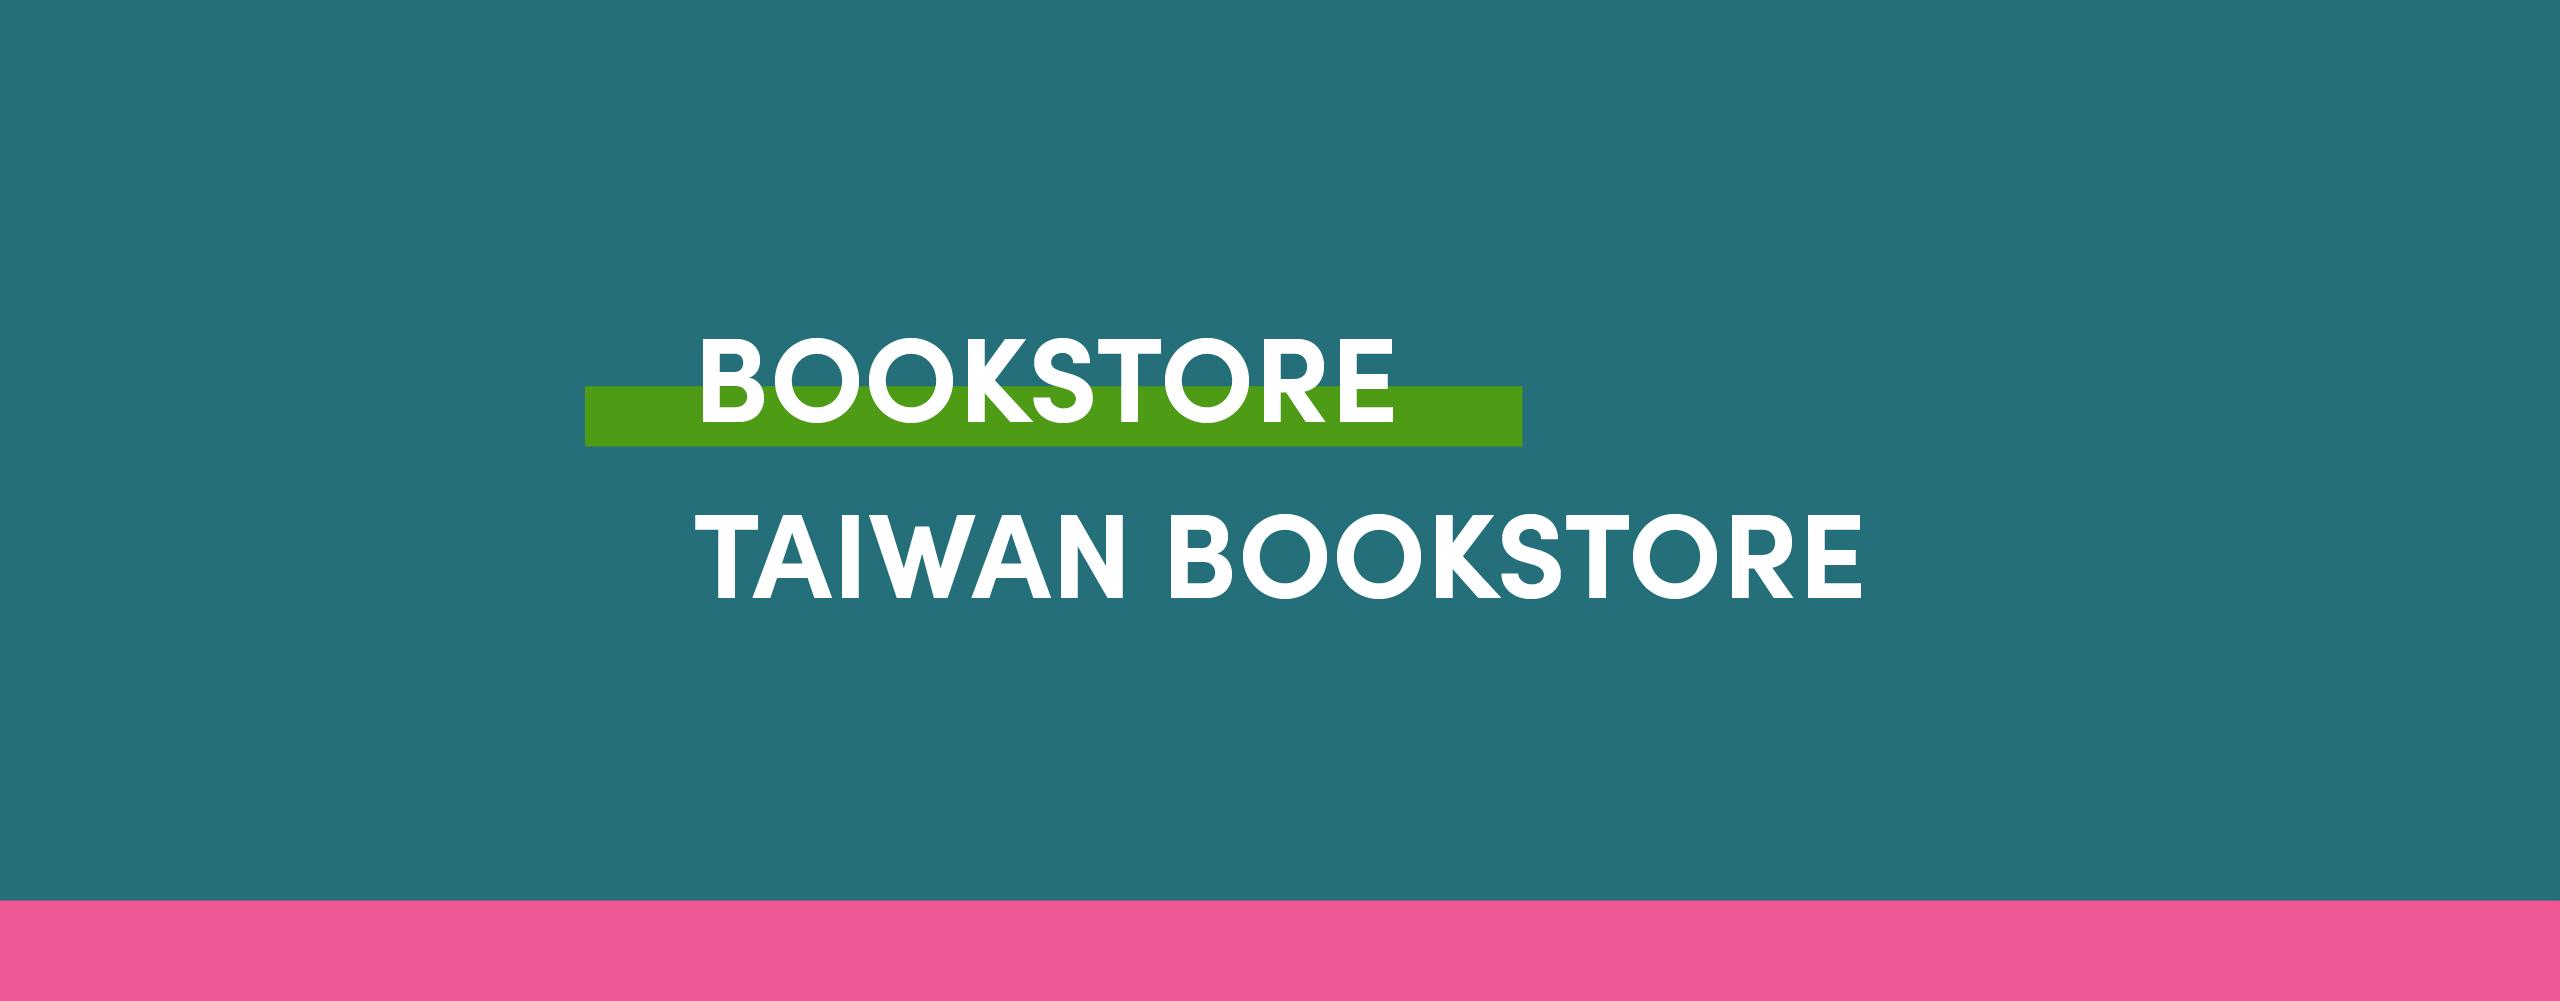 TAIWANfest Letterhead - Bookstore